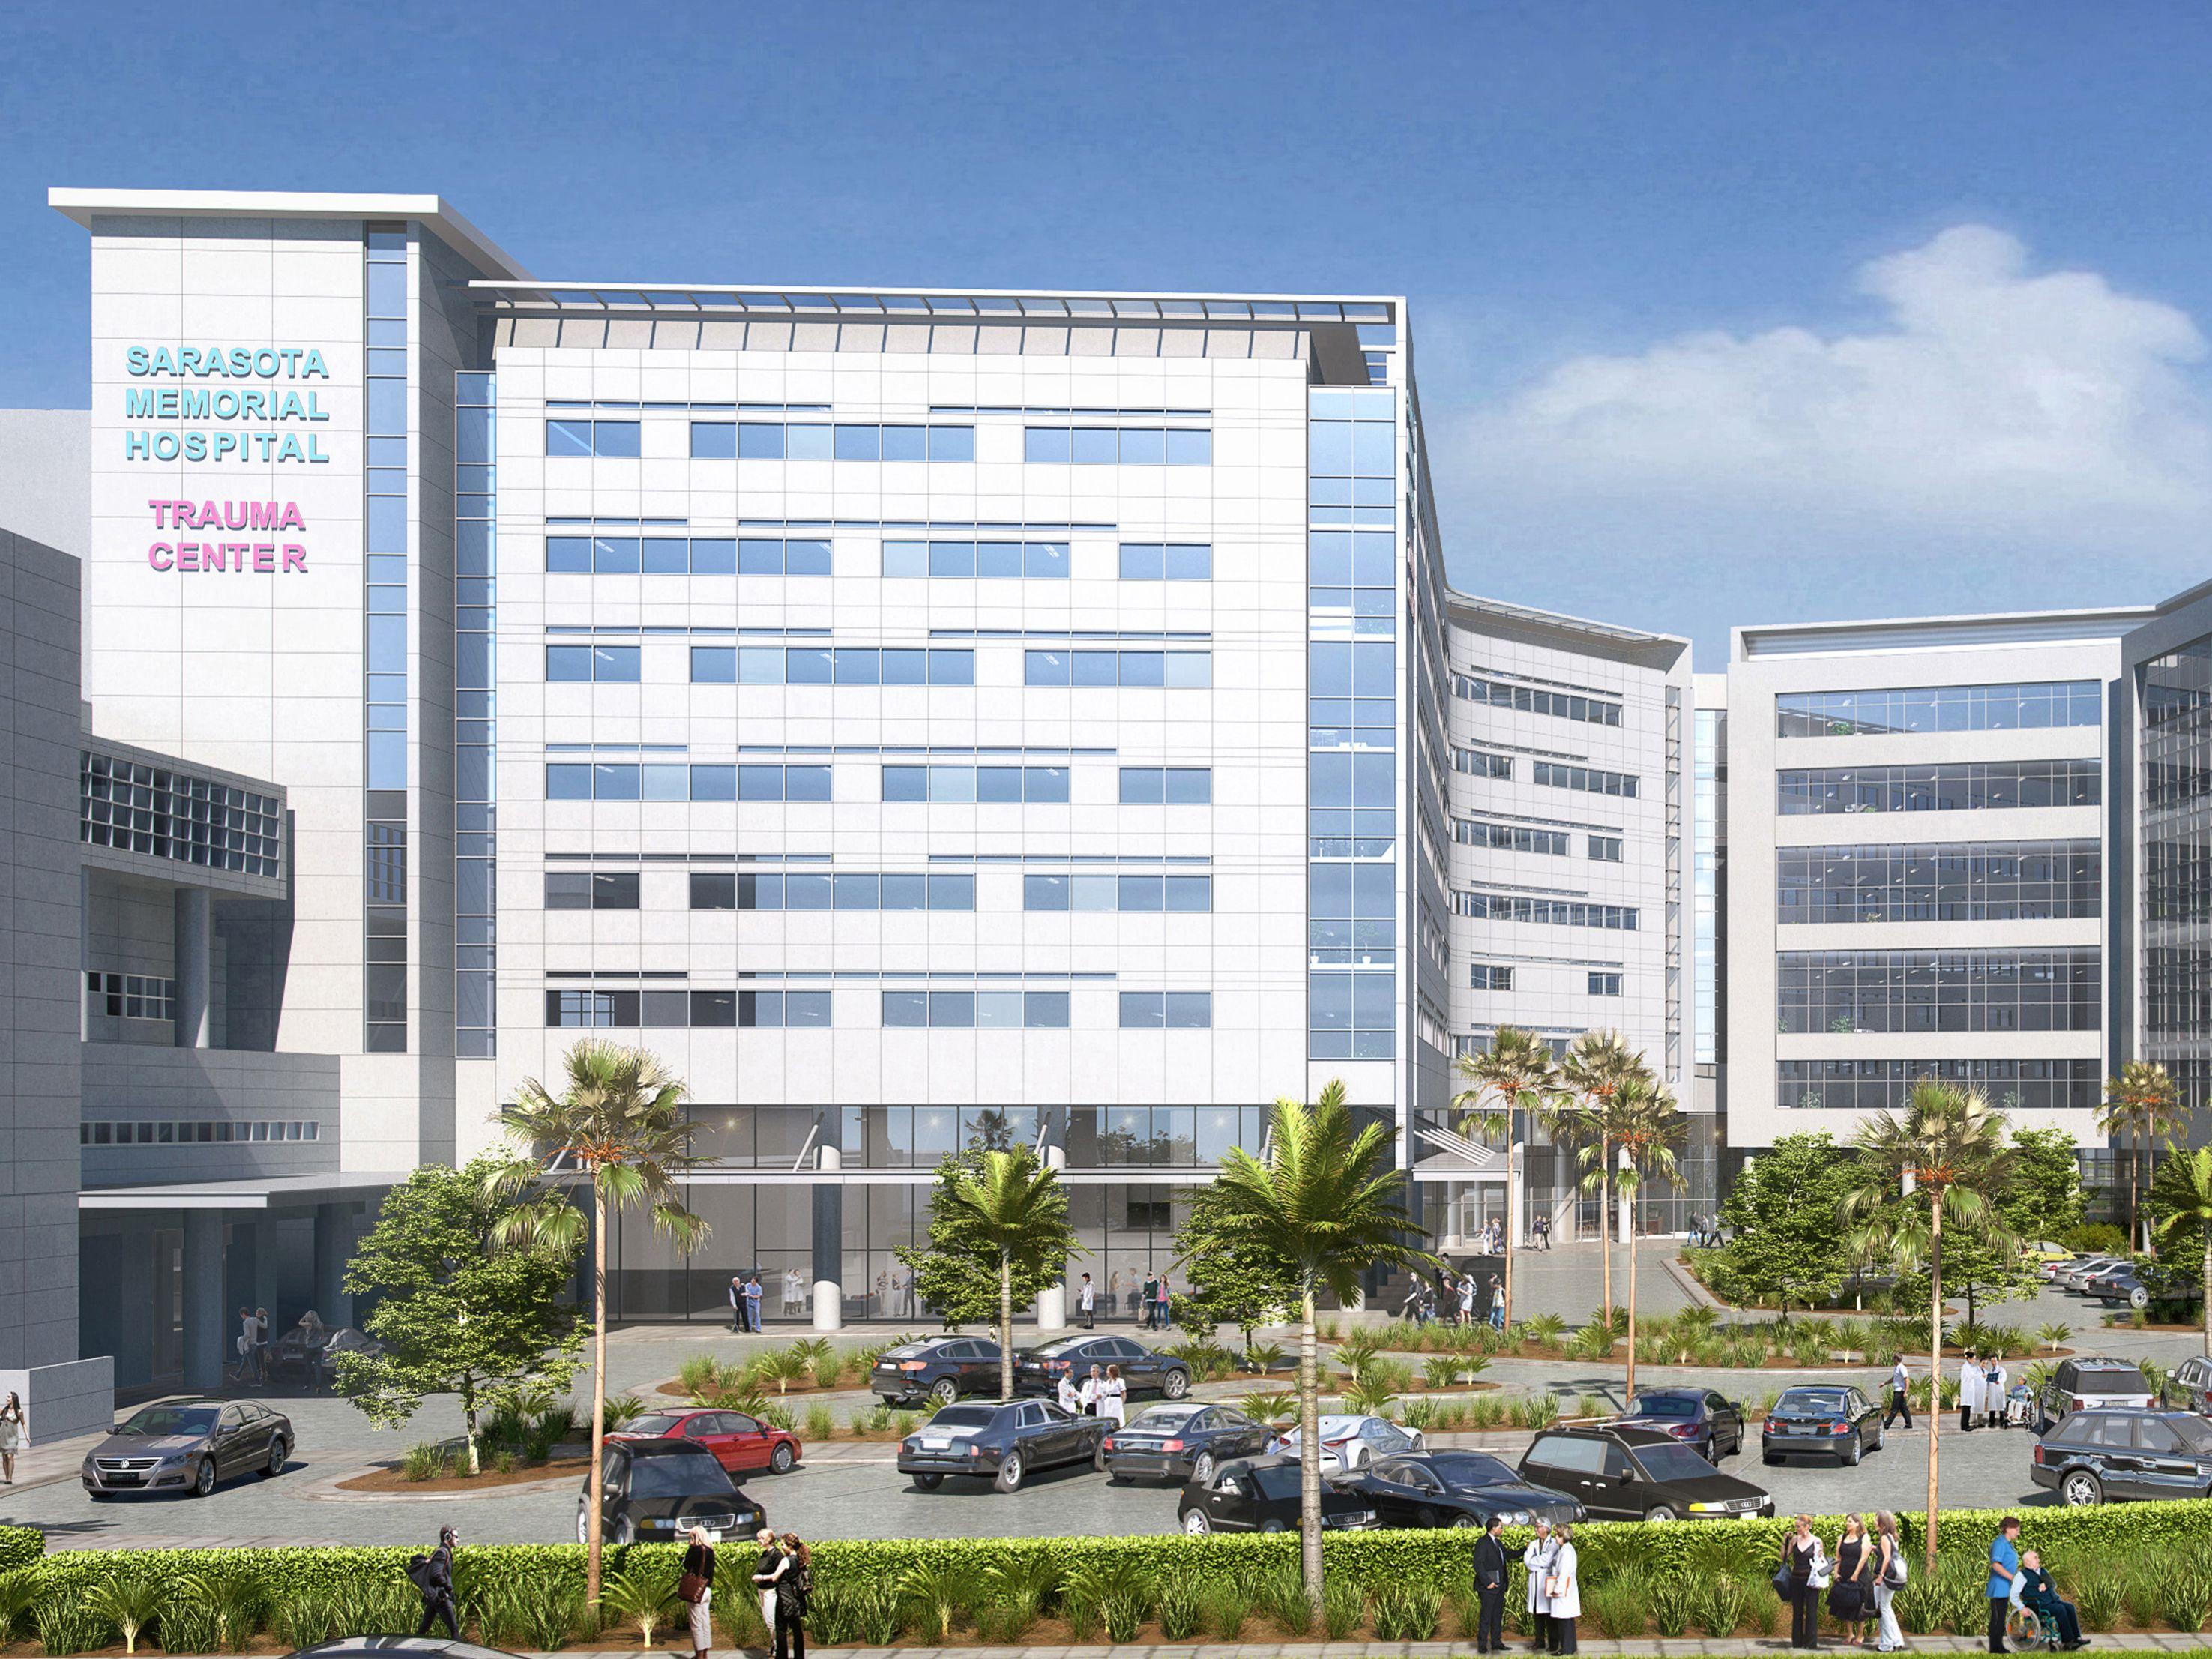 Sarasota memorial hospital uyc2pl